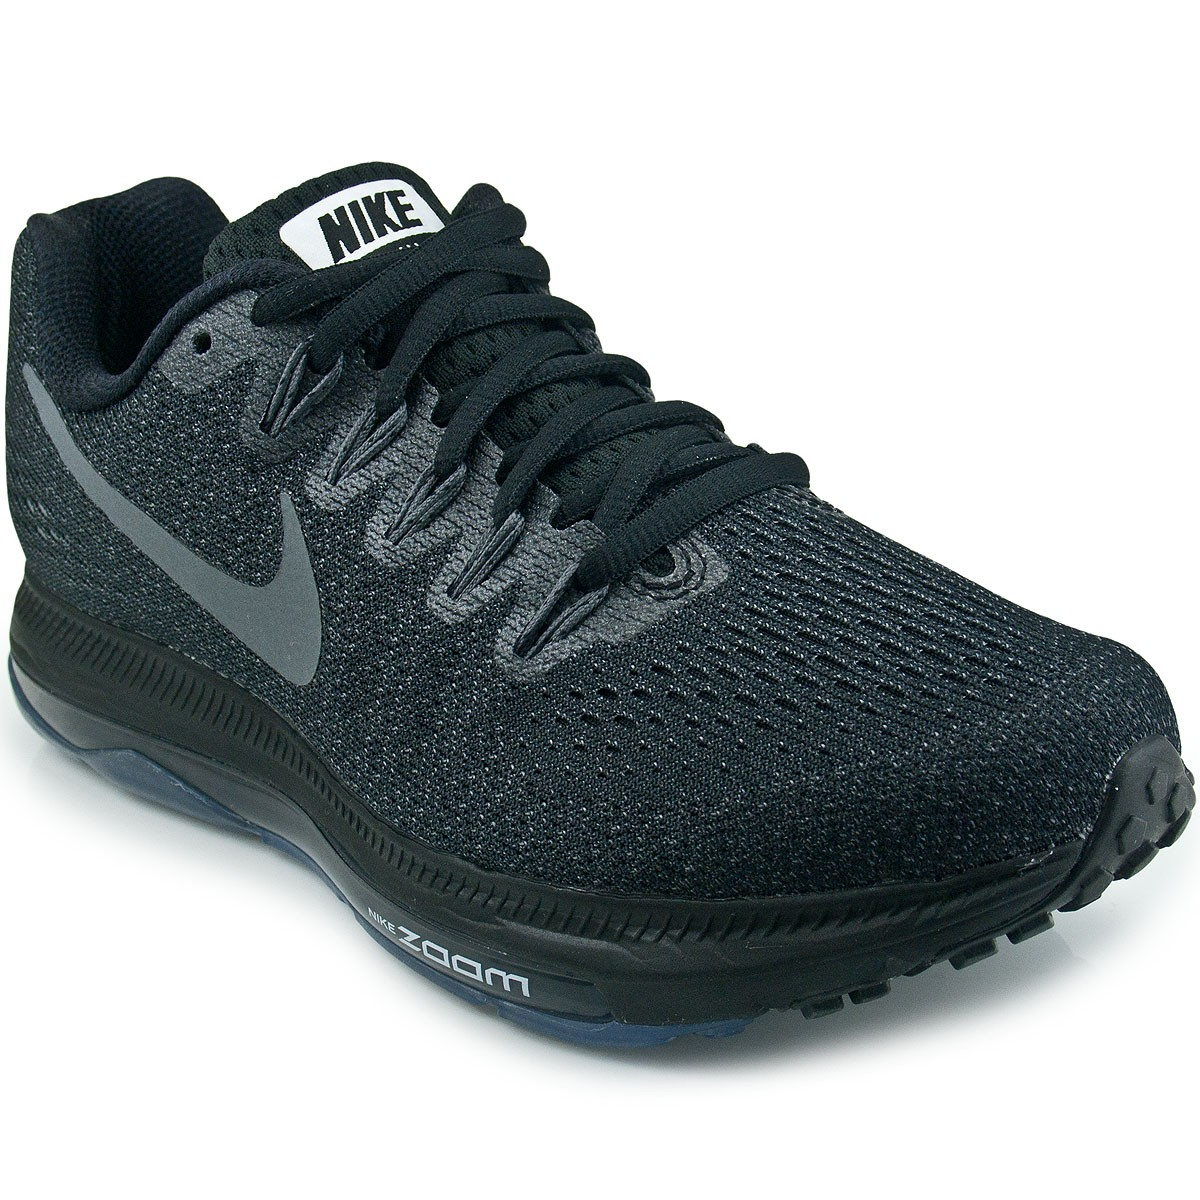 0a5b286fbe604 Tênis Nike Zoom All Out Low W 878671